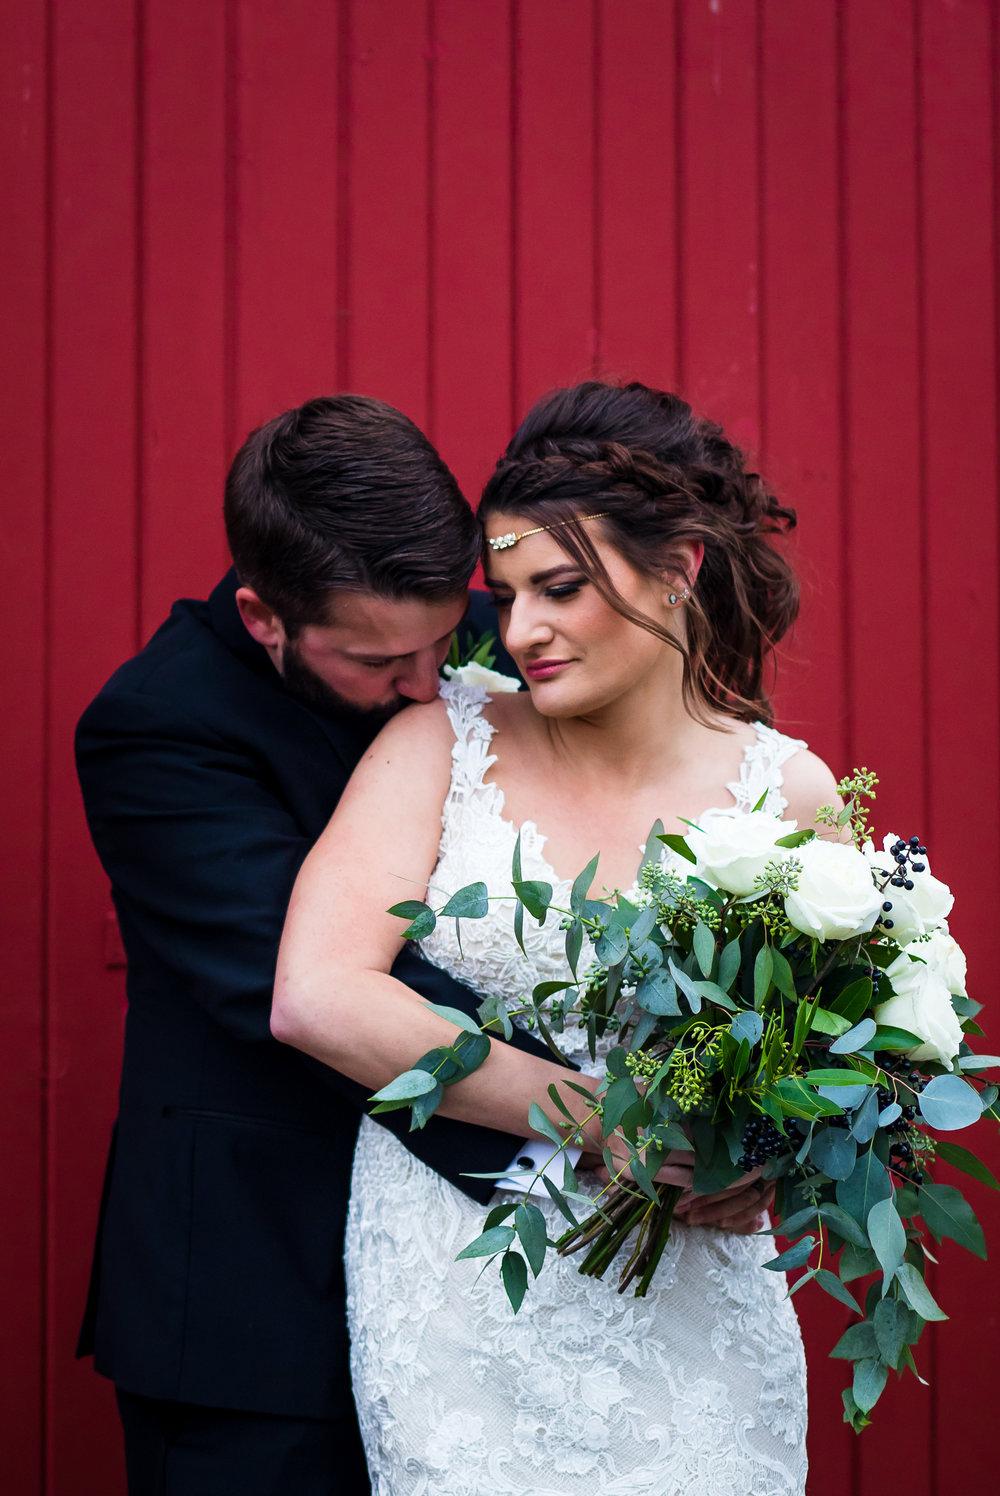 fort-wayne-wedding-photographer-indiana-Auburn-Cord-Duesenberg-automobile-museum